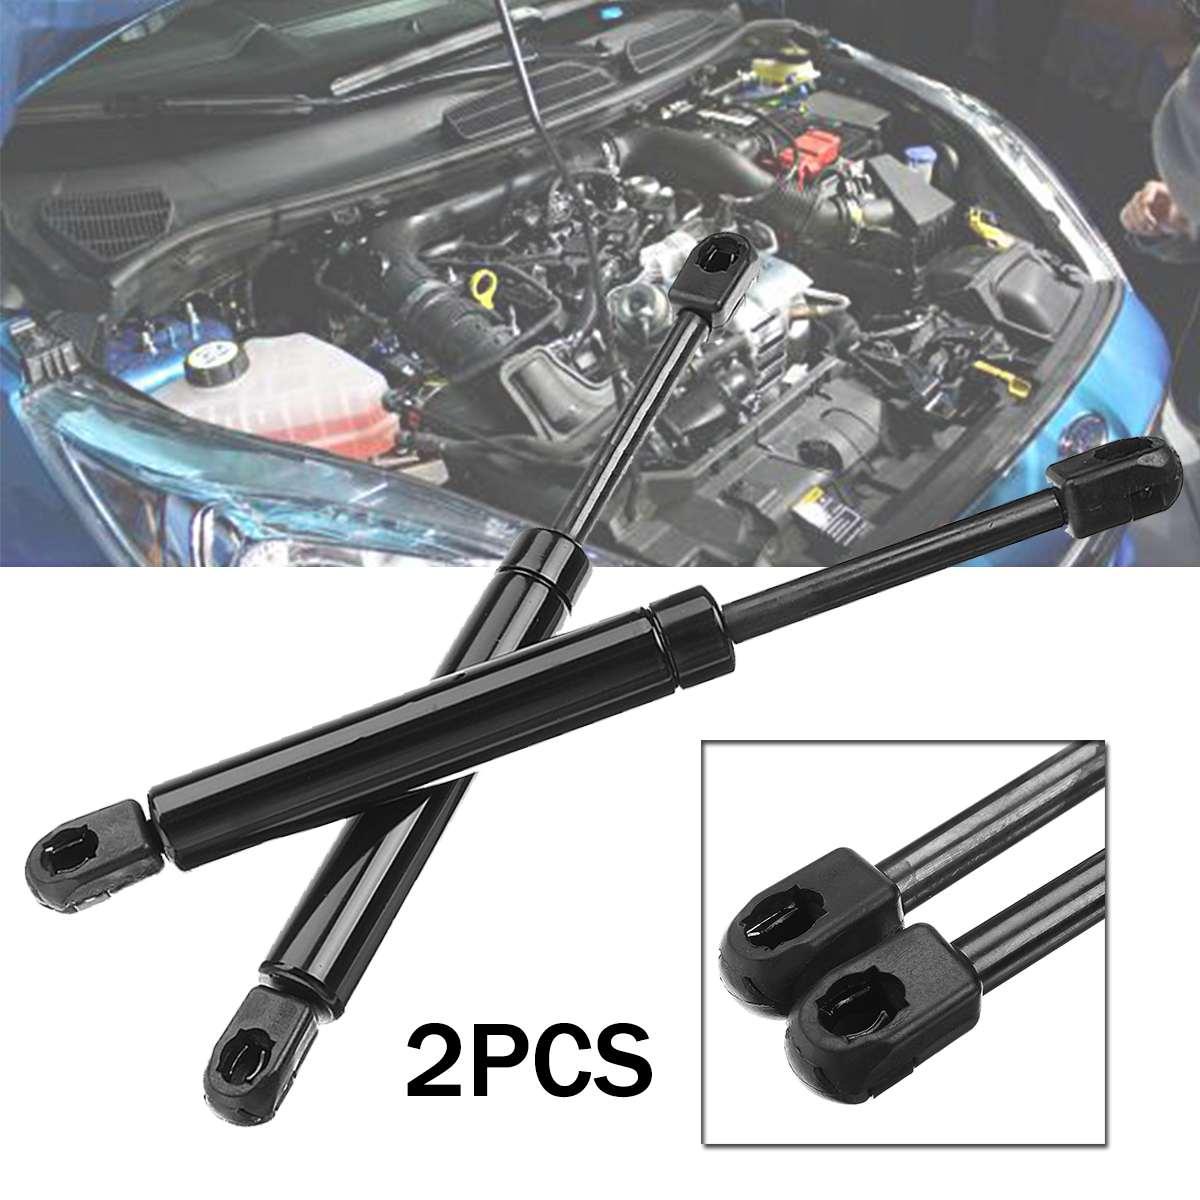 2 stuks Voor Ford voor Mondeo MK3 2000 2001 2002 2003 2004 2005 2006 2007 Auto-Styling Motorkap Gas springs Stutten Hood Shock Lifters